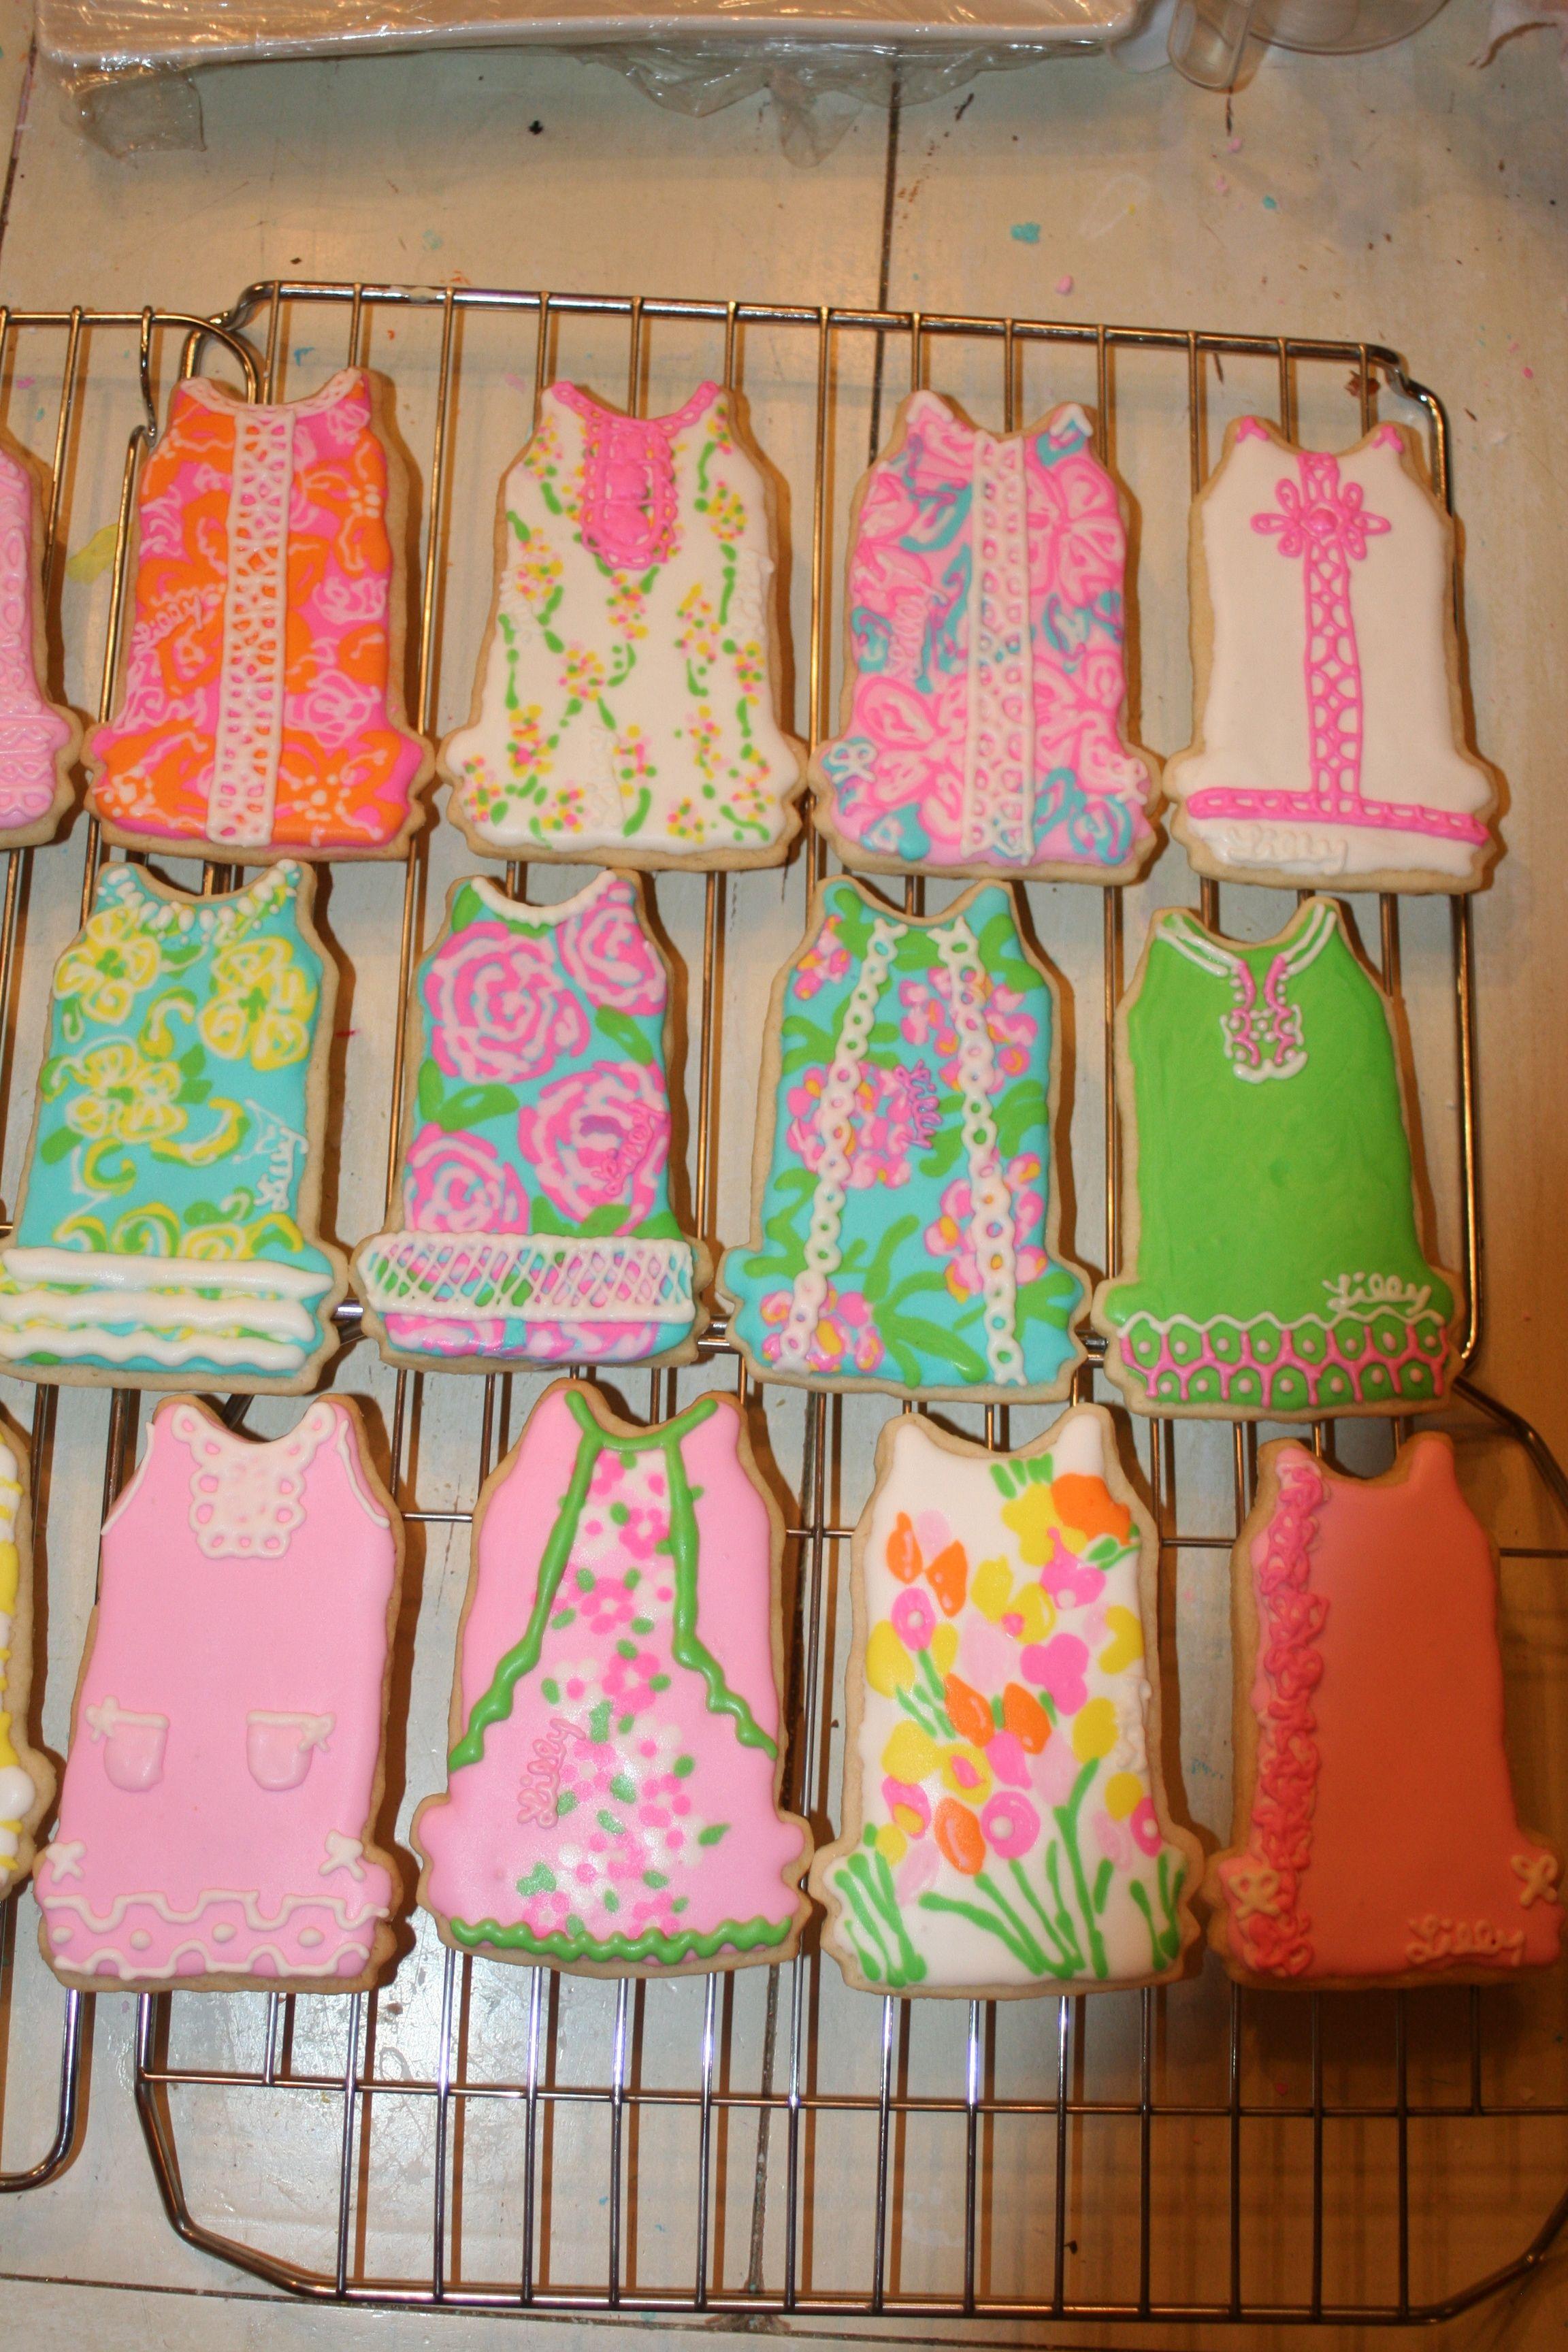 Lilly Pulitzer sugar cookies Lilly Pulitzer sugar